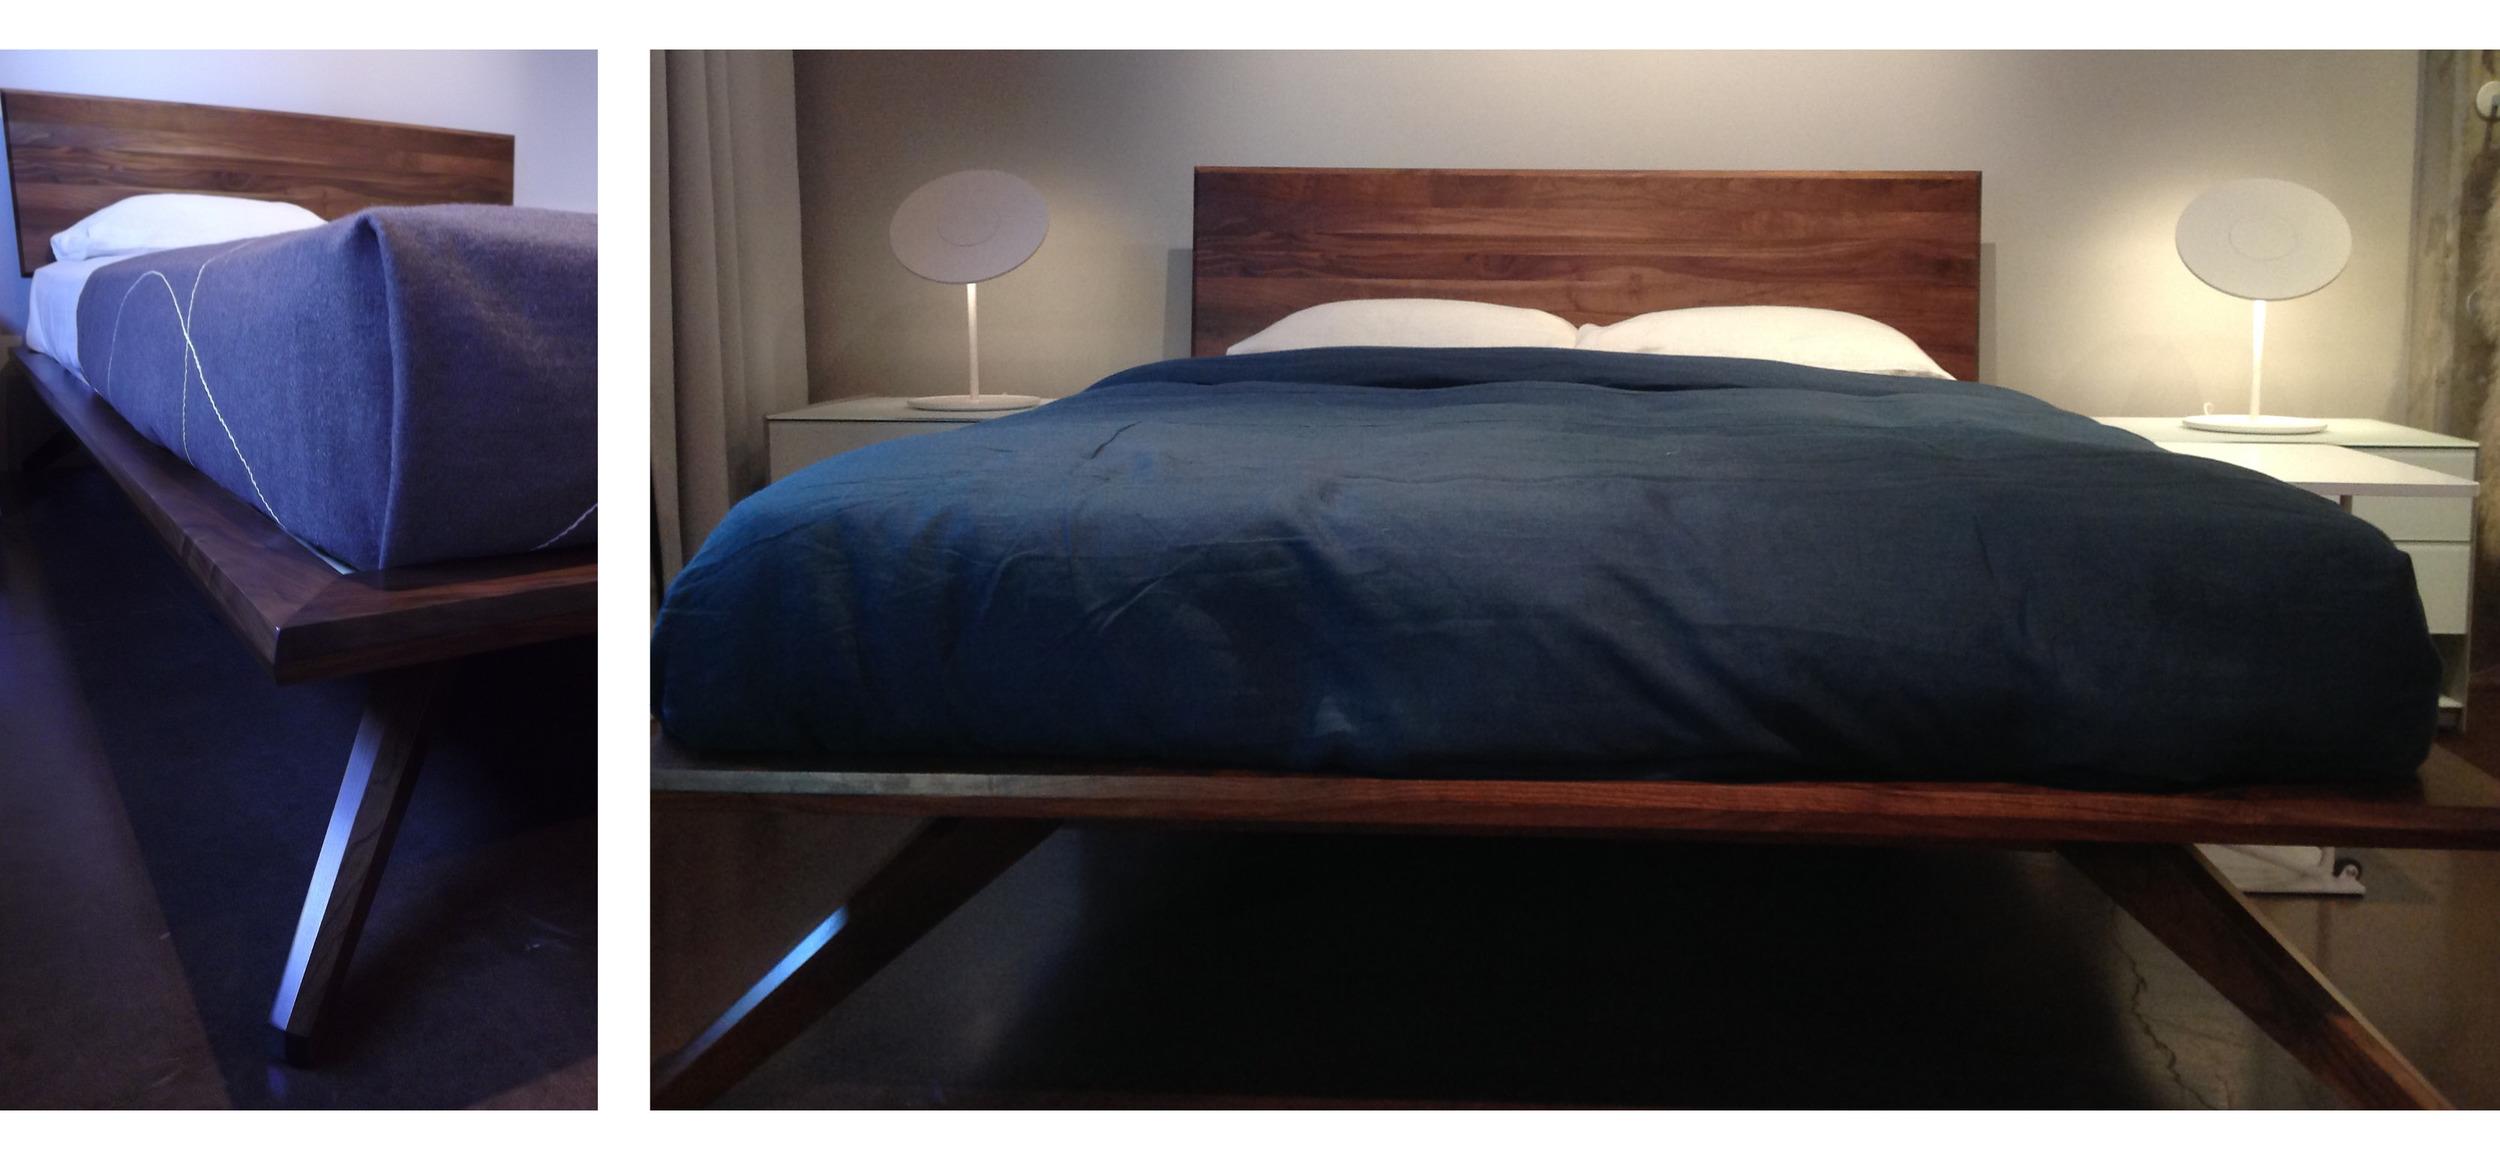 bed_2040photos.jpg